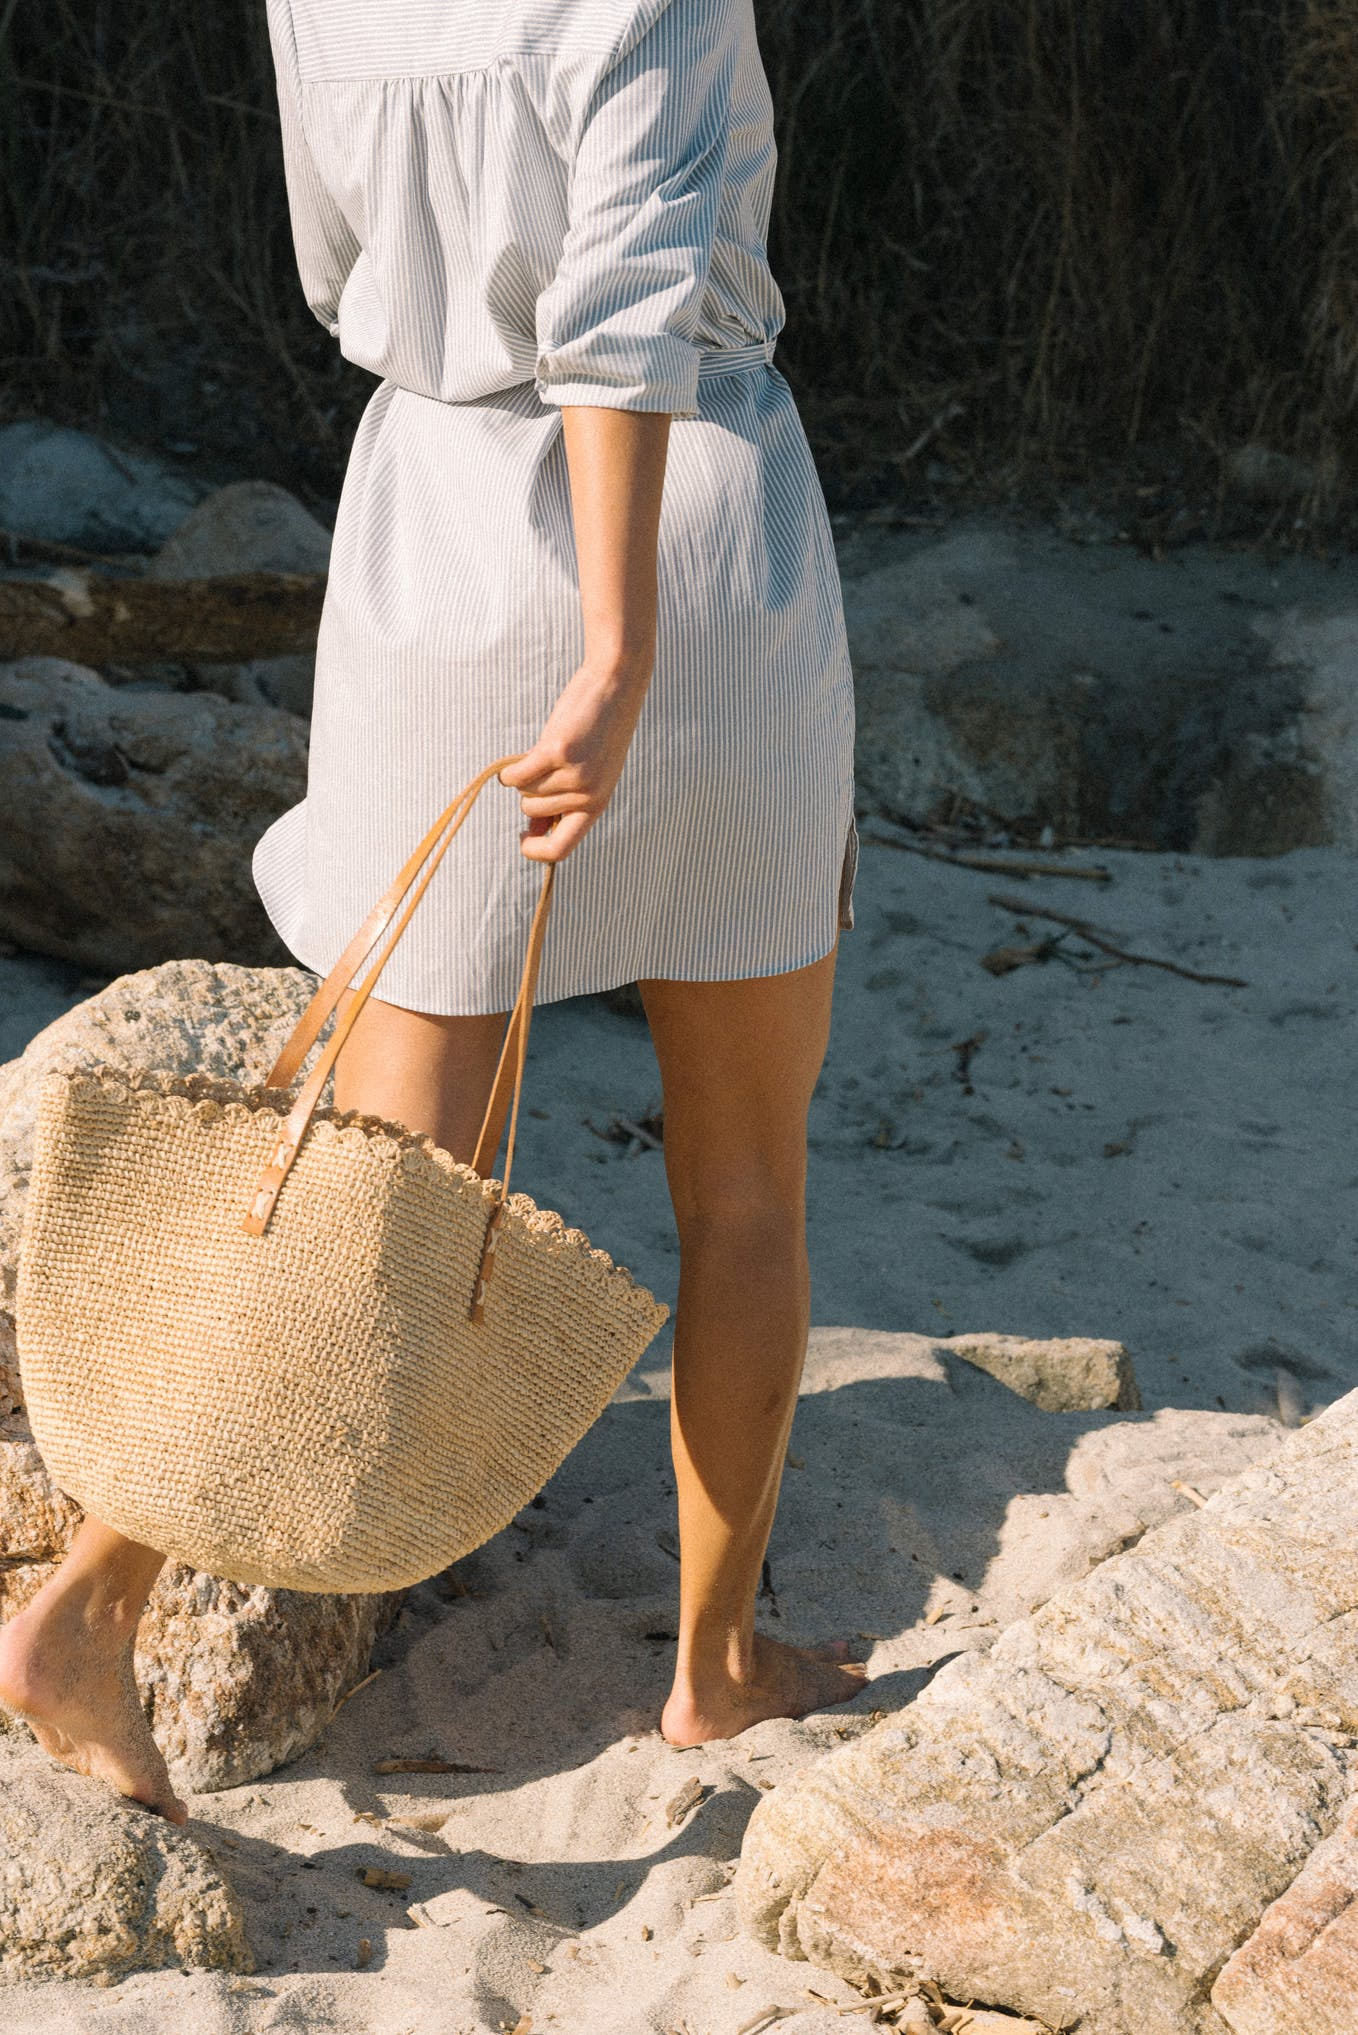 Dress Après la plage stripes denim and ecru